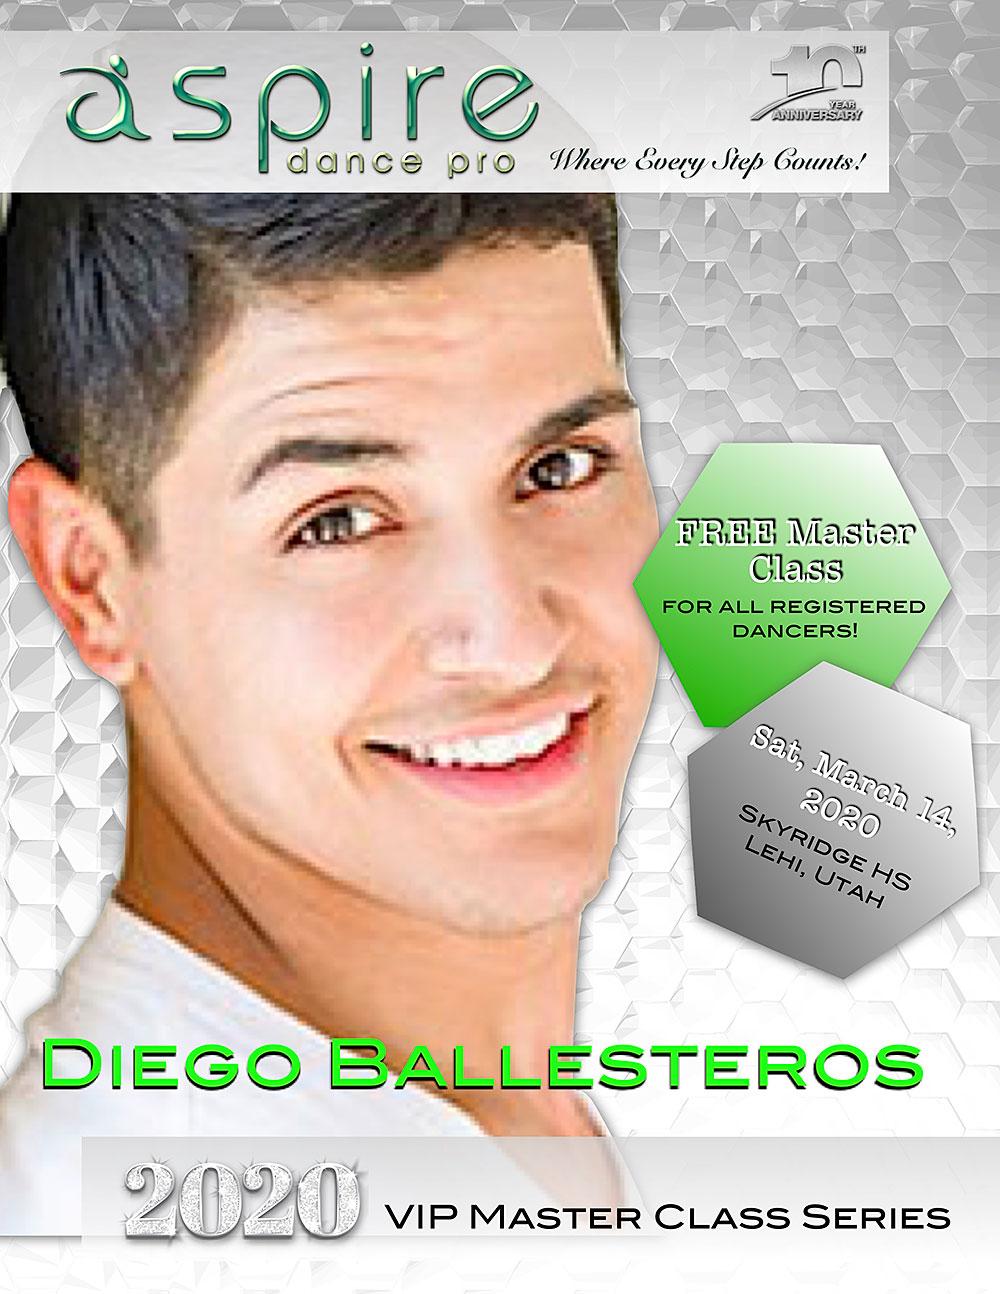 Diego Ballesteros - Aspire 2020 VIP Master Class Series